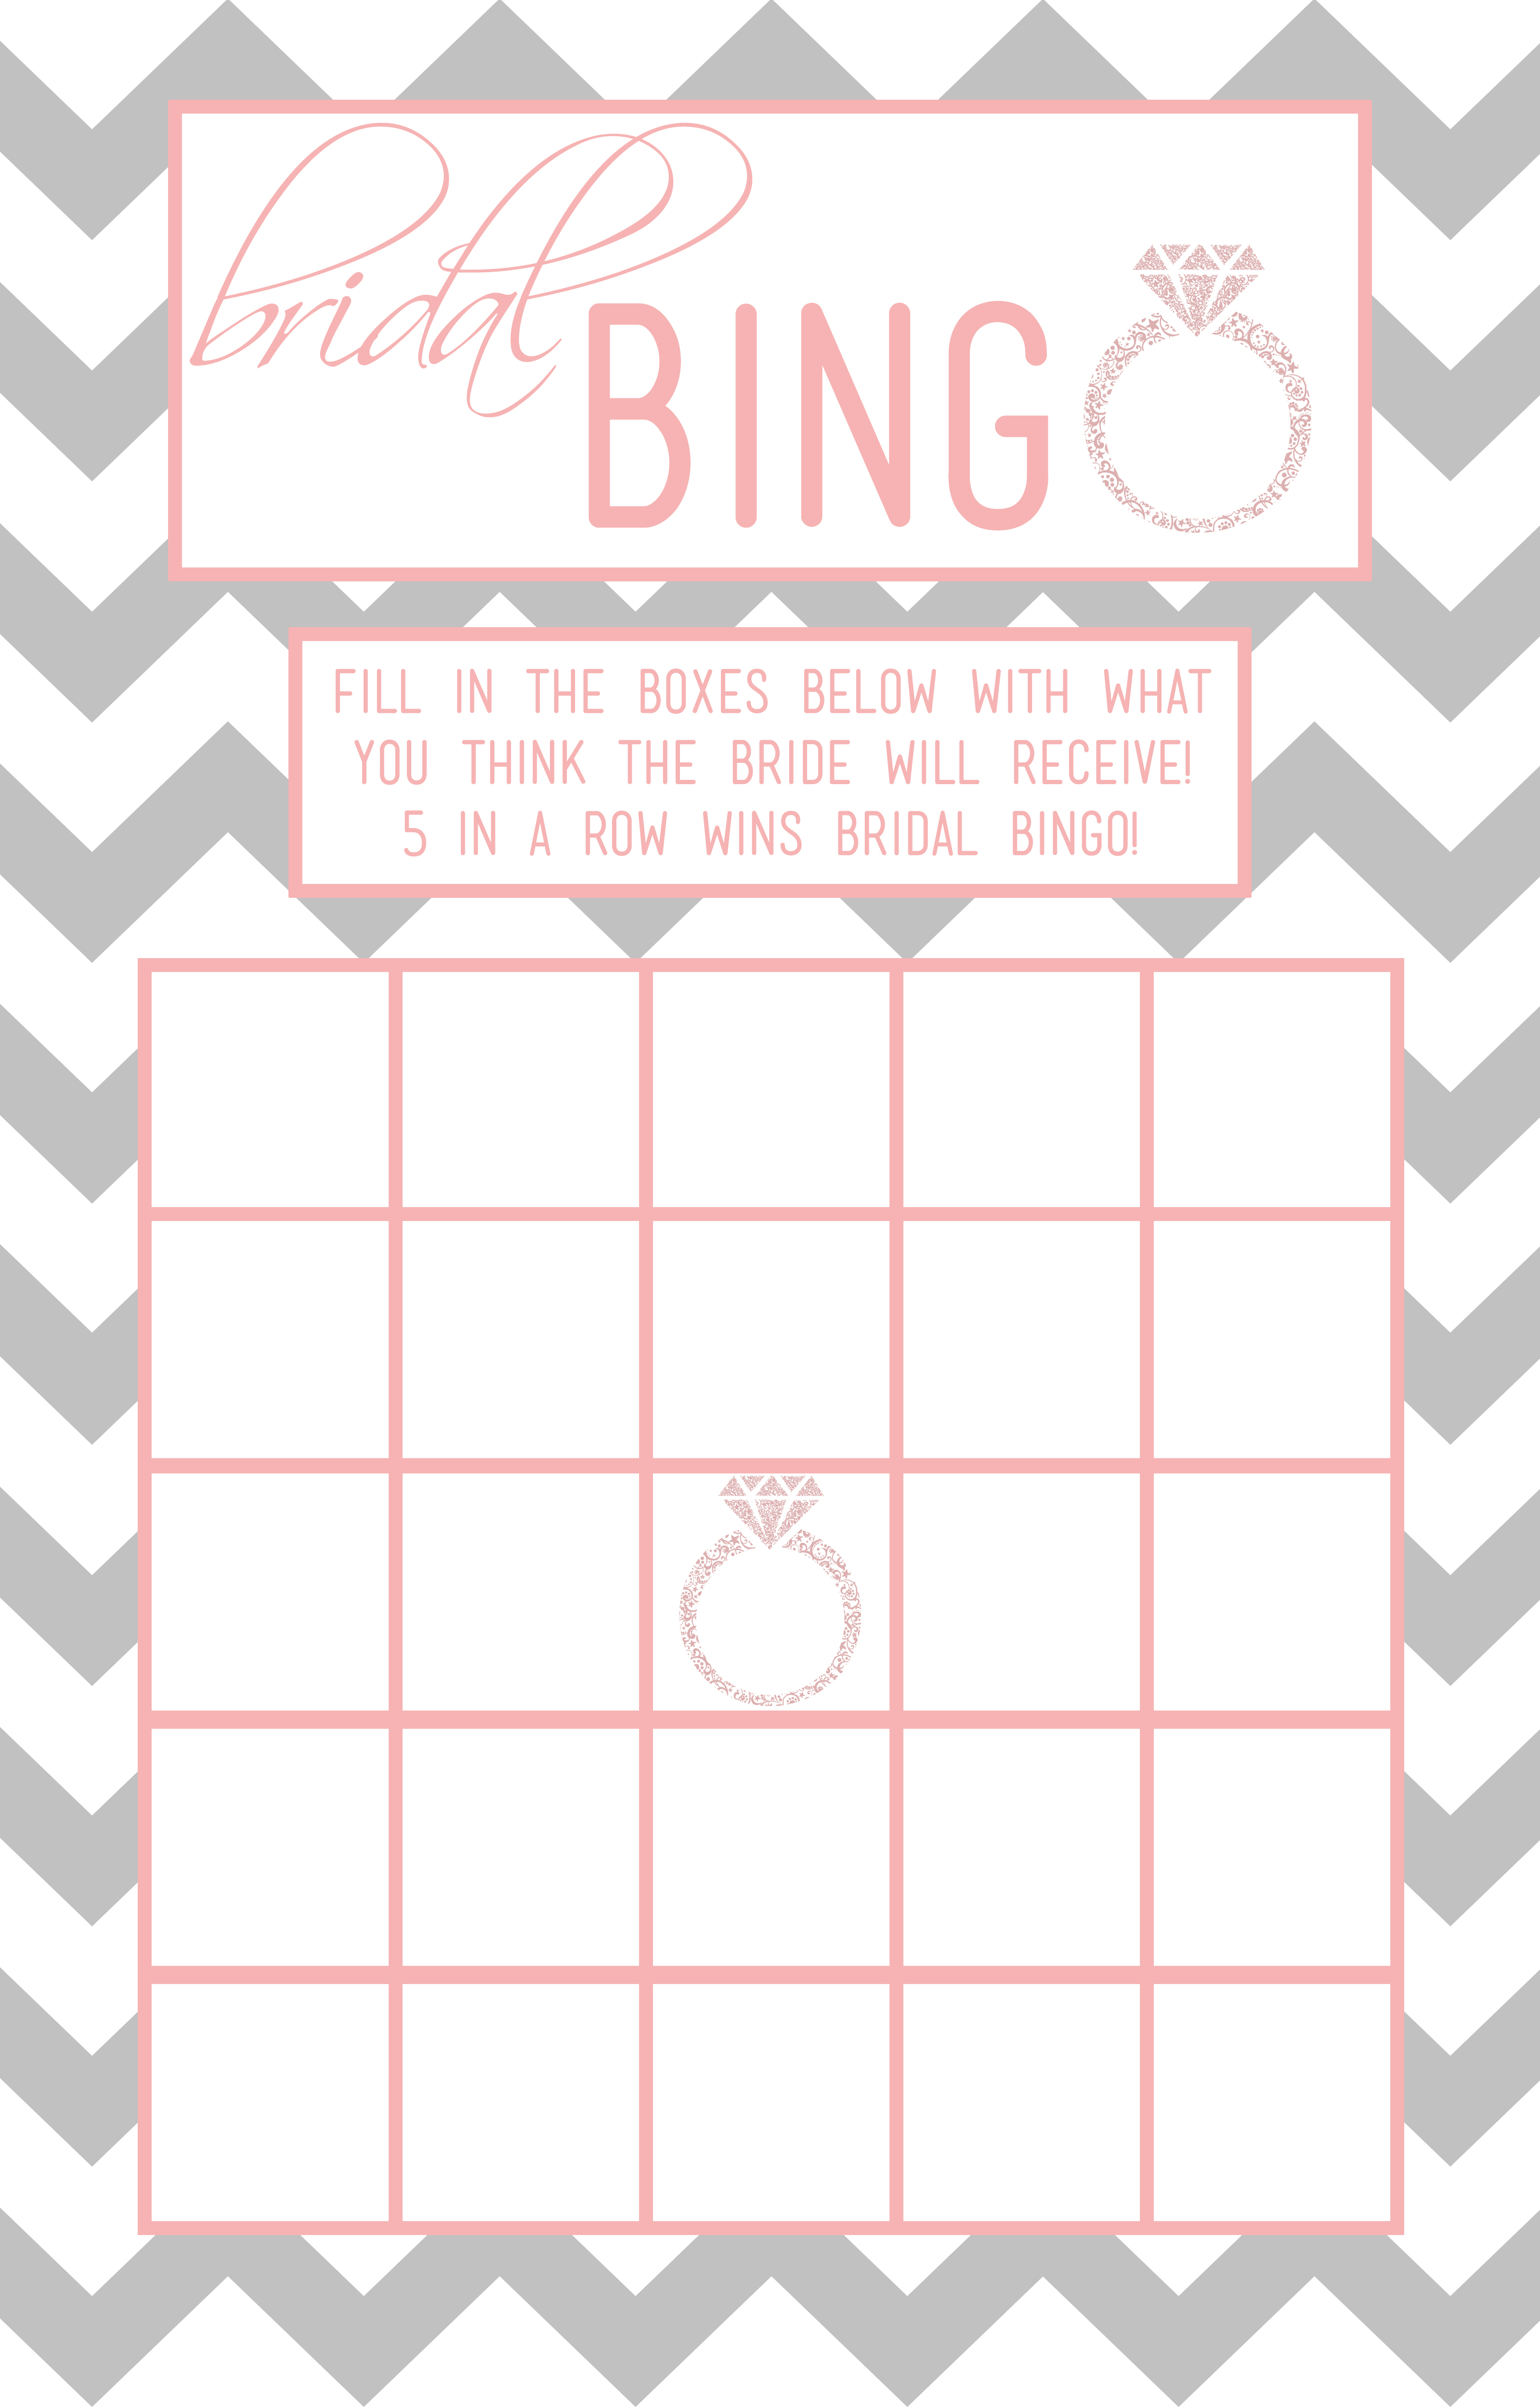 30 Images Of Template For Wedding Shower Bingo | Helmettown - Free Printable Bridal Shower Blank Bingo Games